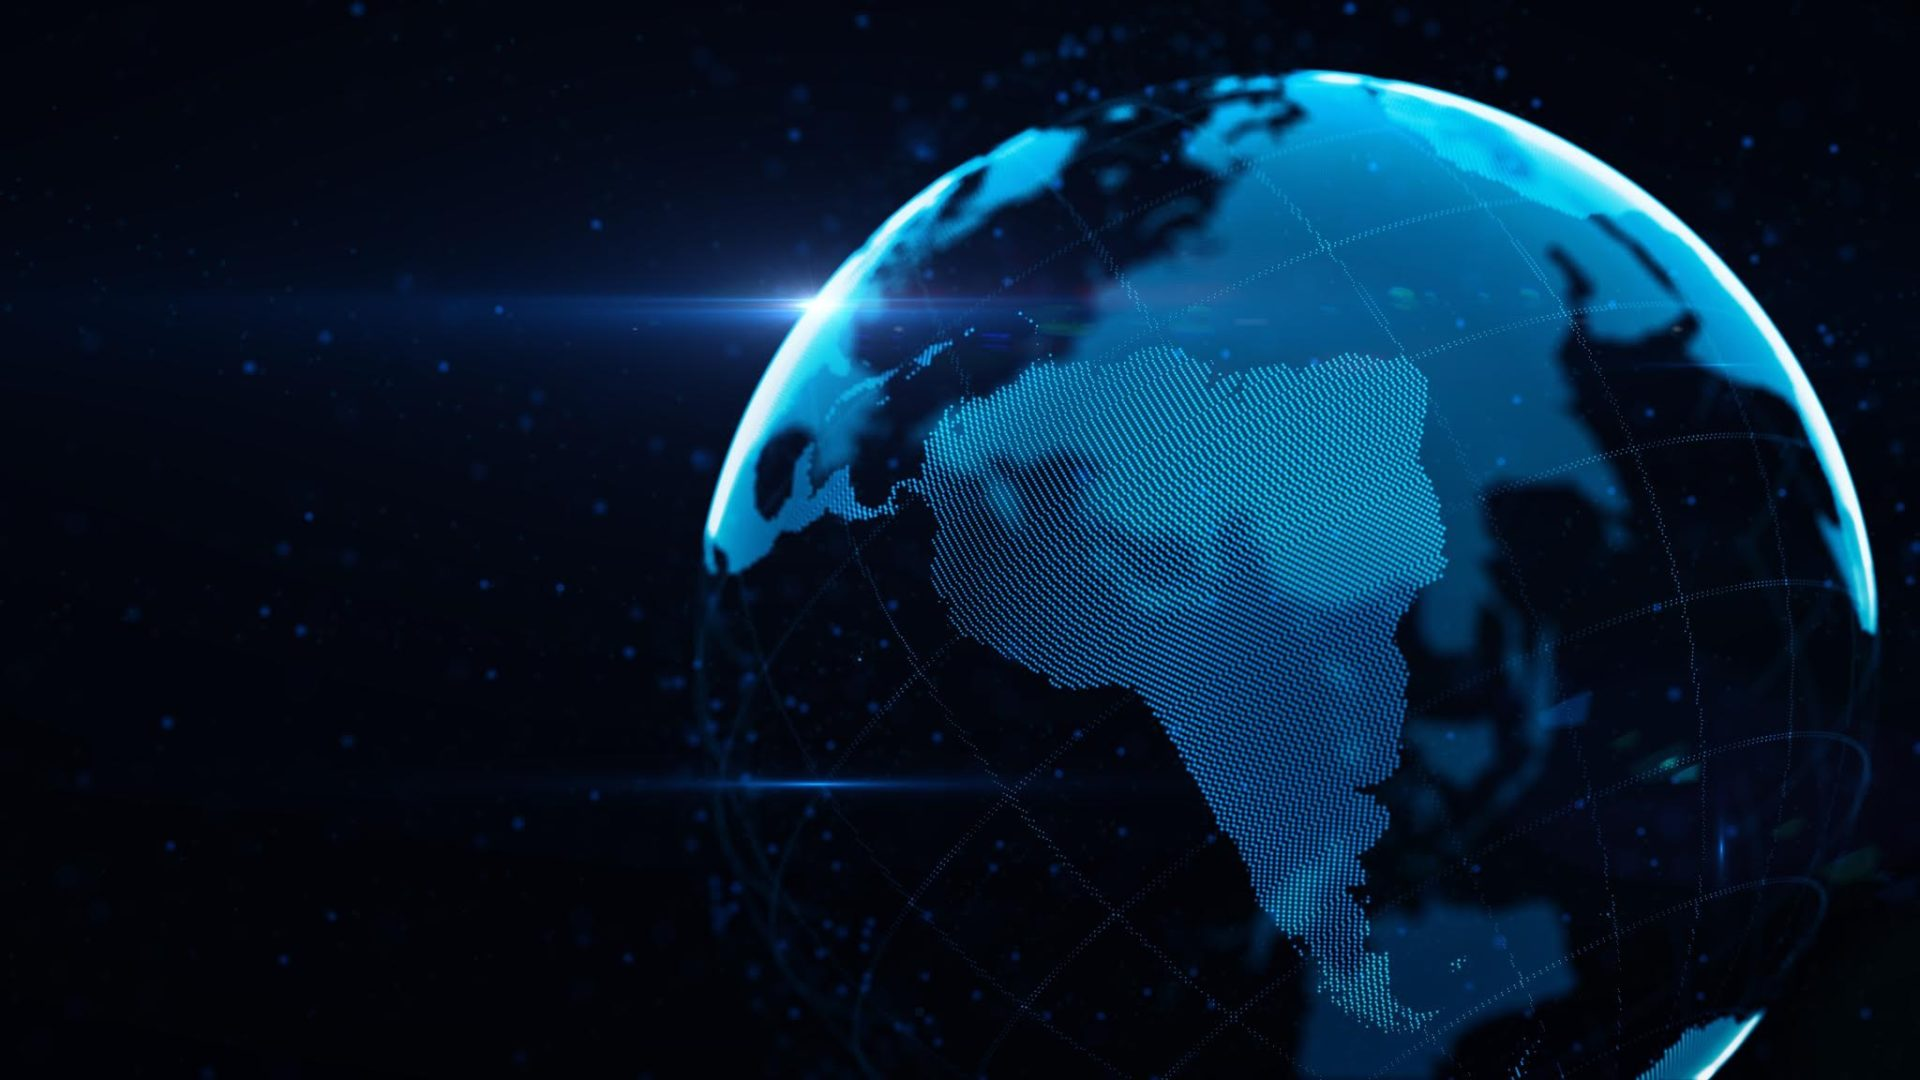 https://accionistaseinversores.bbva.com/wp-content/uploads/2019/03/america-latina-mapa-universo-globo-bbva-recurso-1920x1080.jpg